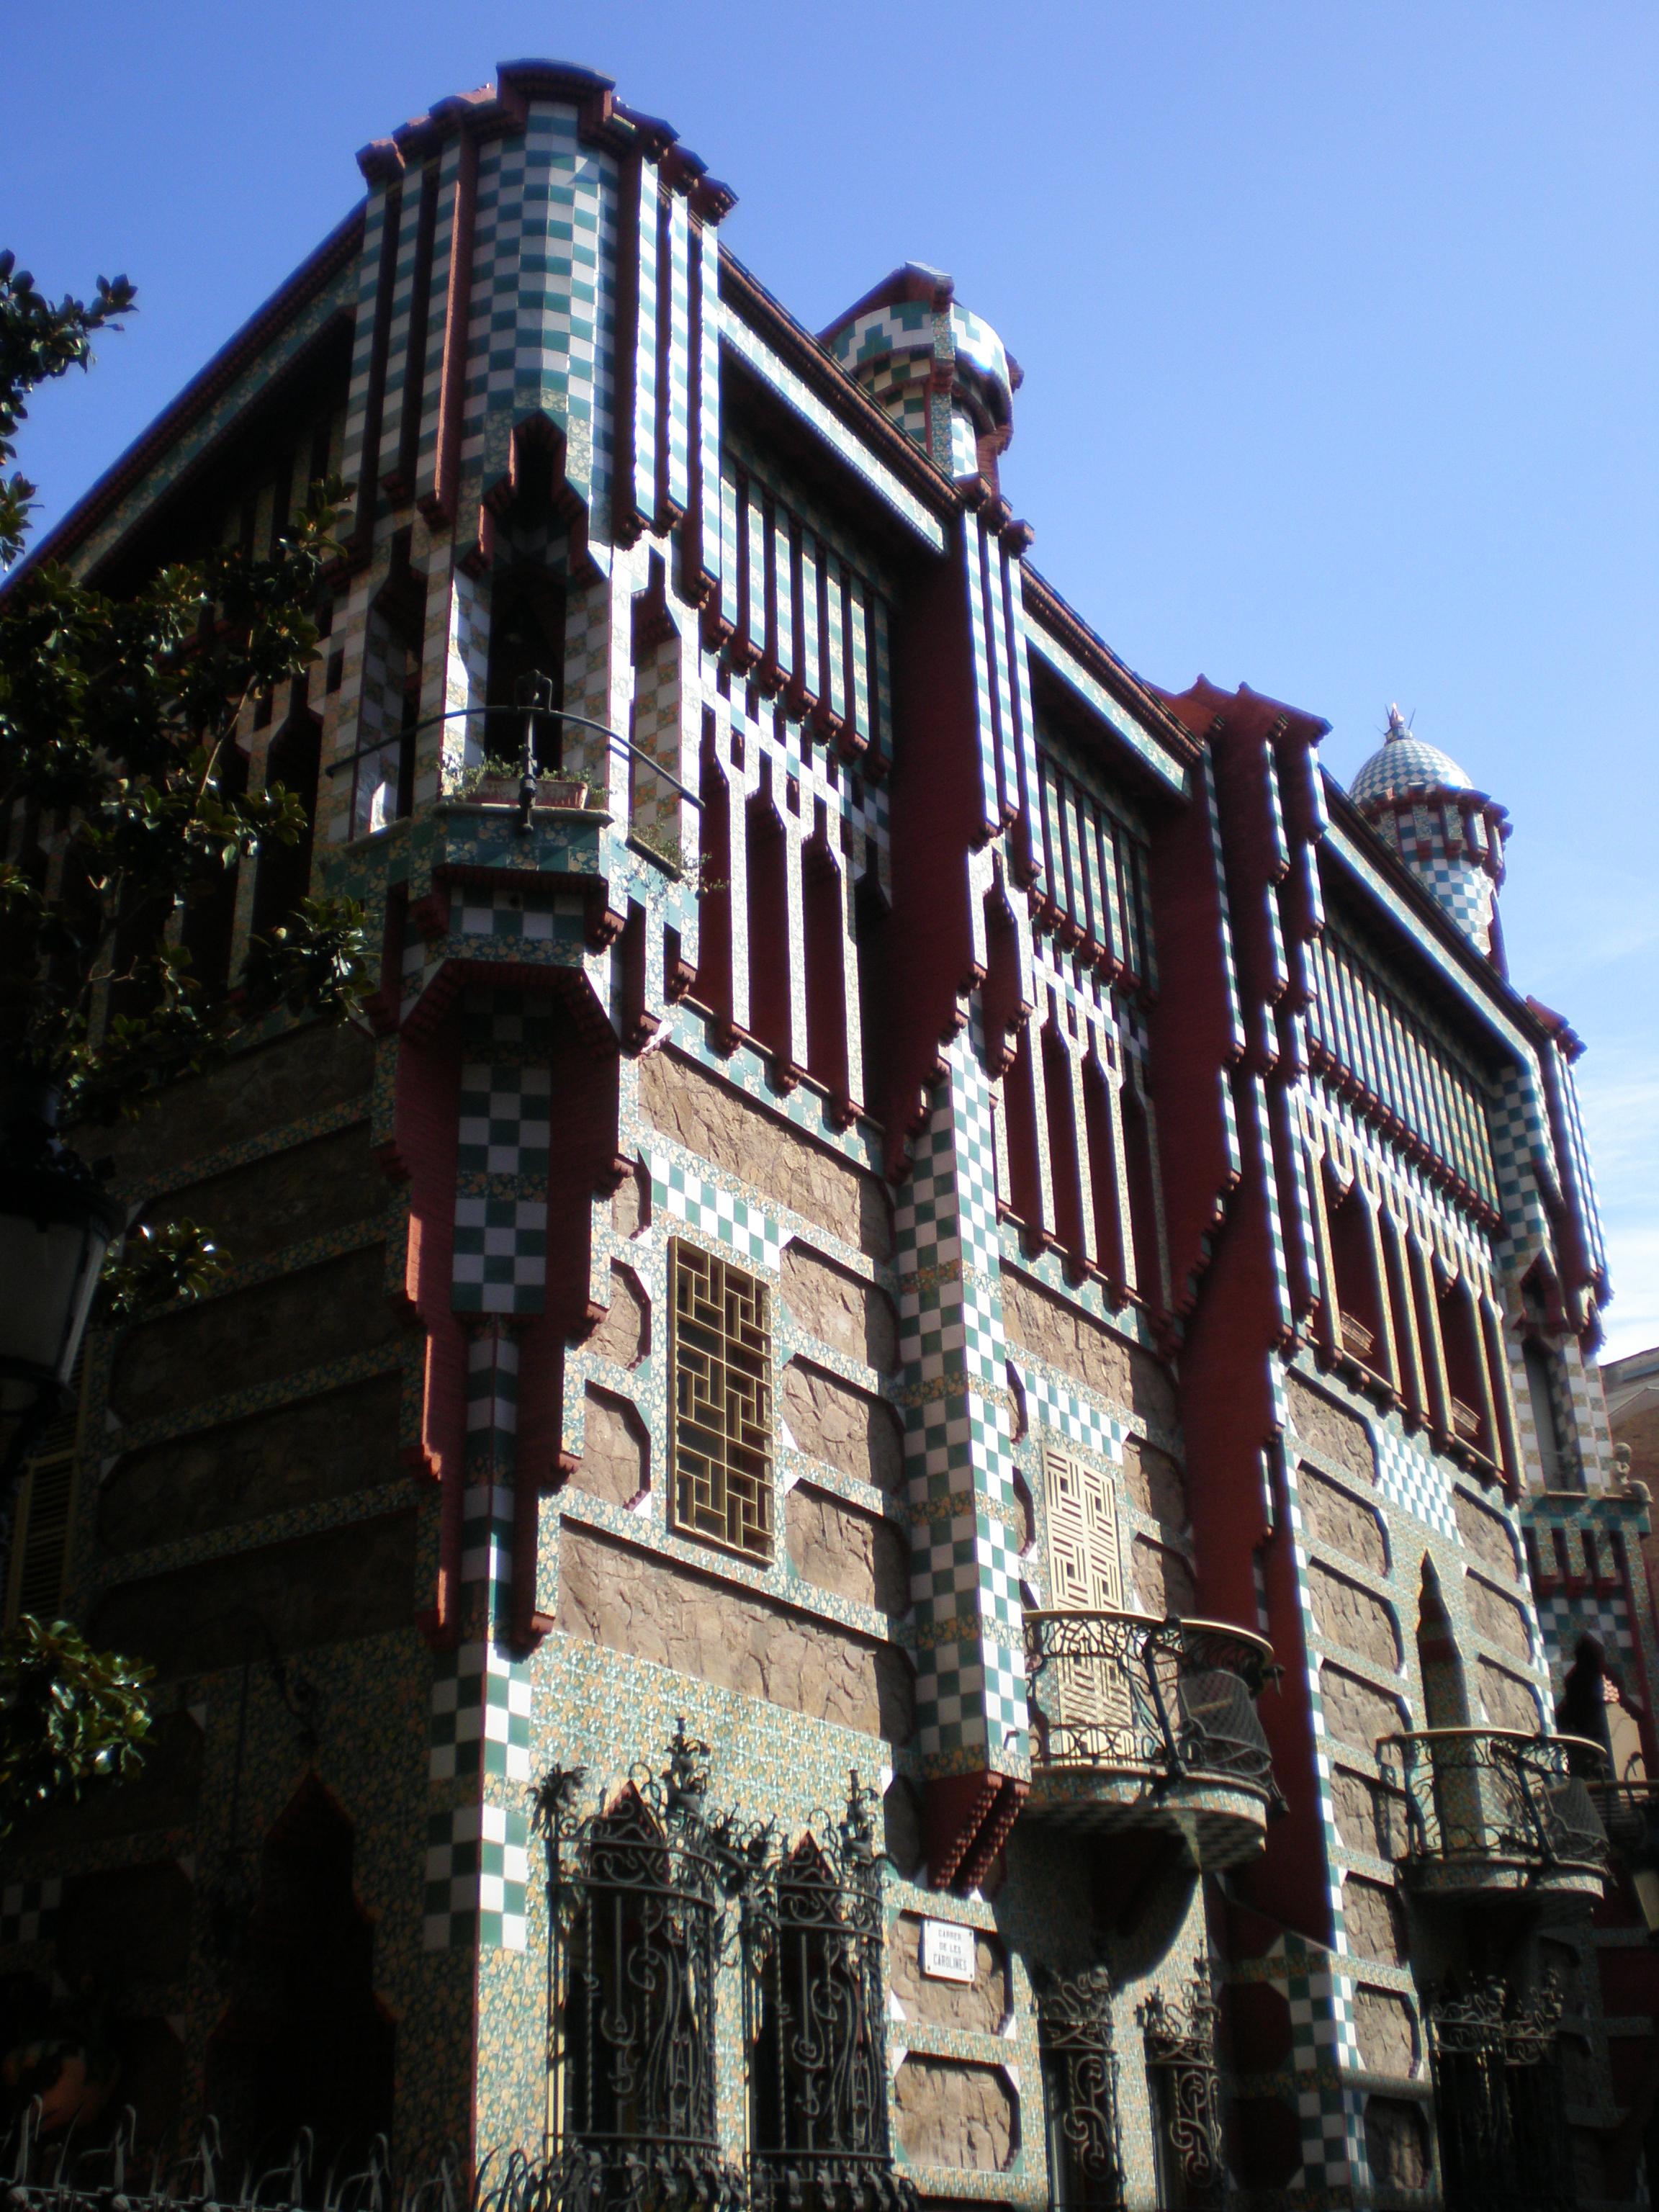 FileCasa Vicens Barcelona  5jpg  Wikimedia Commons